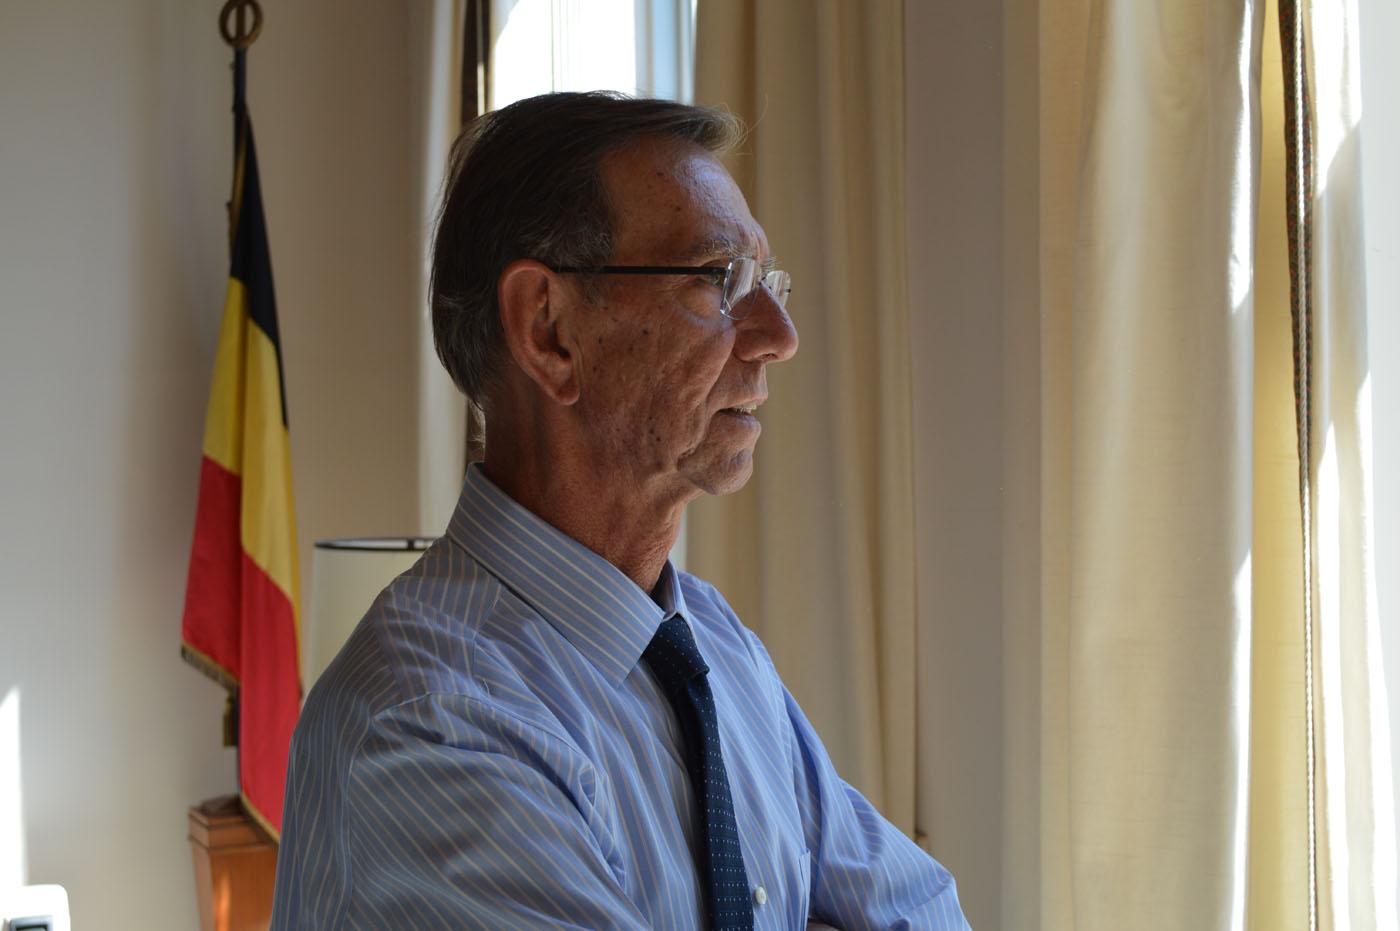 Belgian ambassador pushes back against terrorism blame